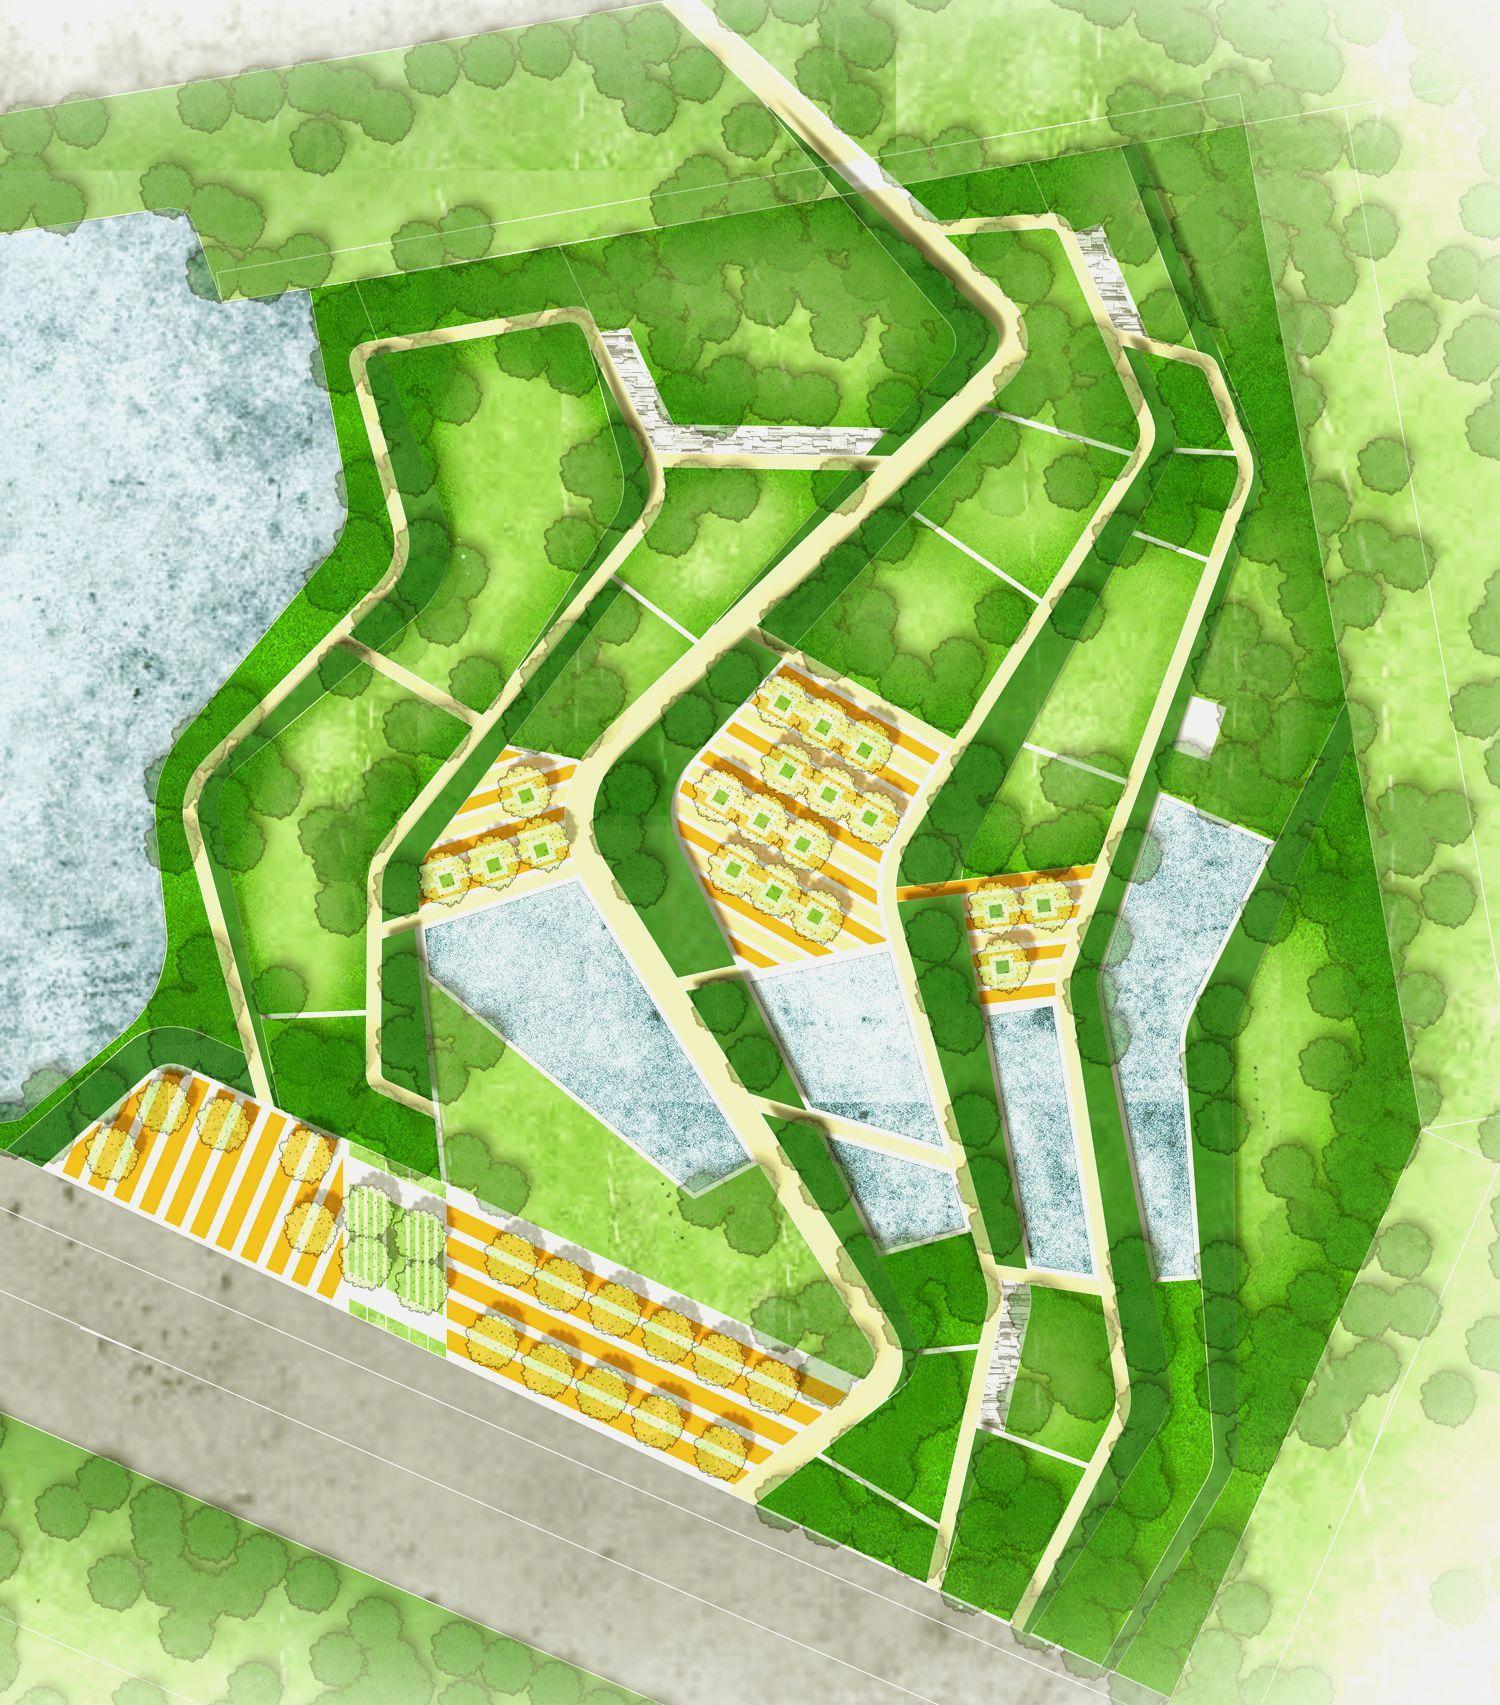 Landscape Gardening Exeter Landscape Gardening Jobs ...